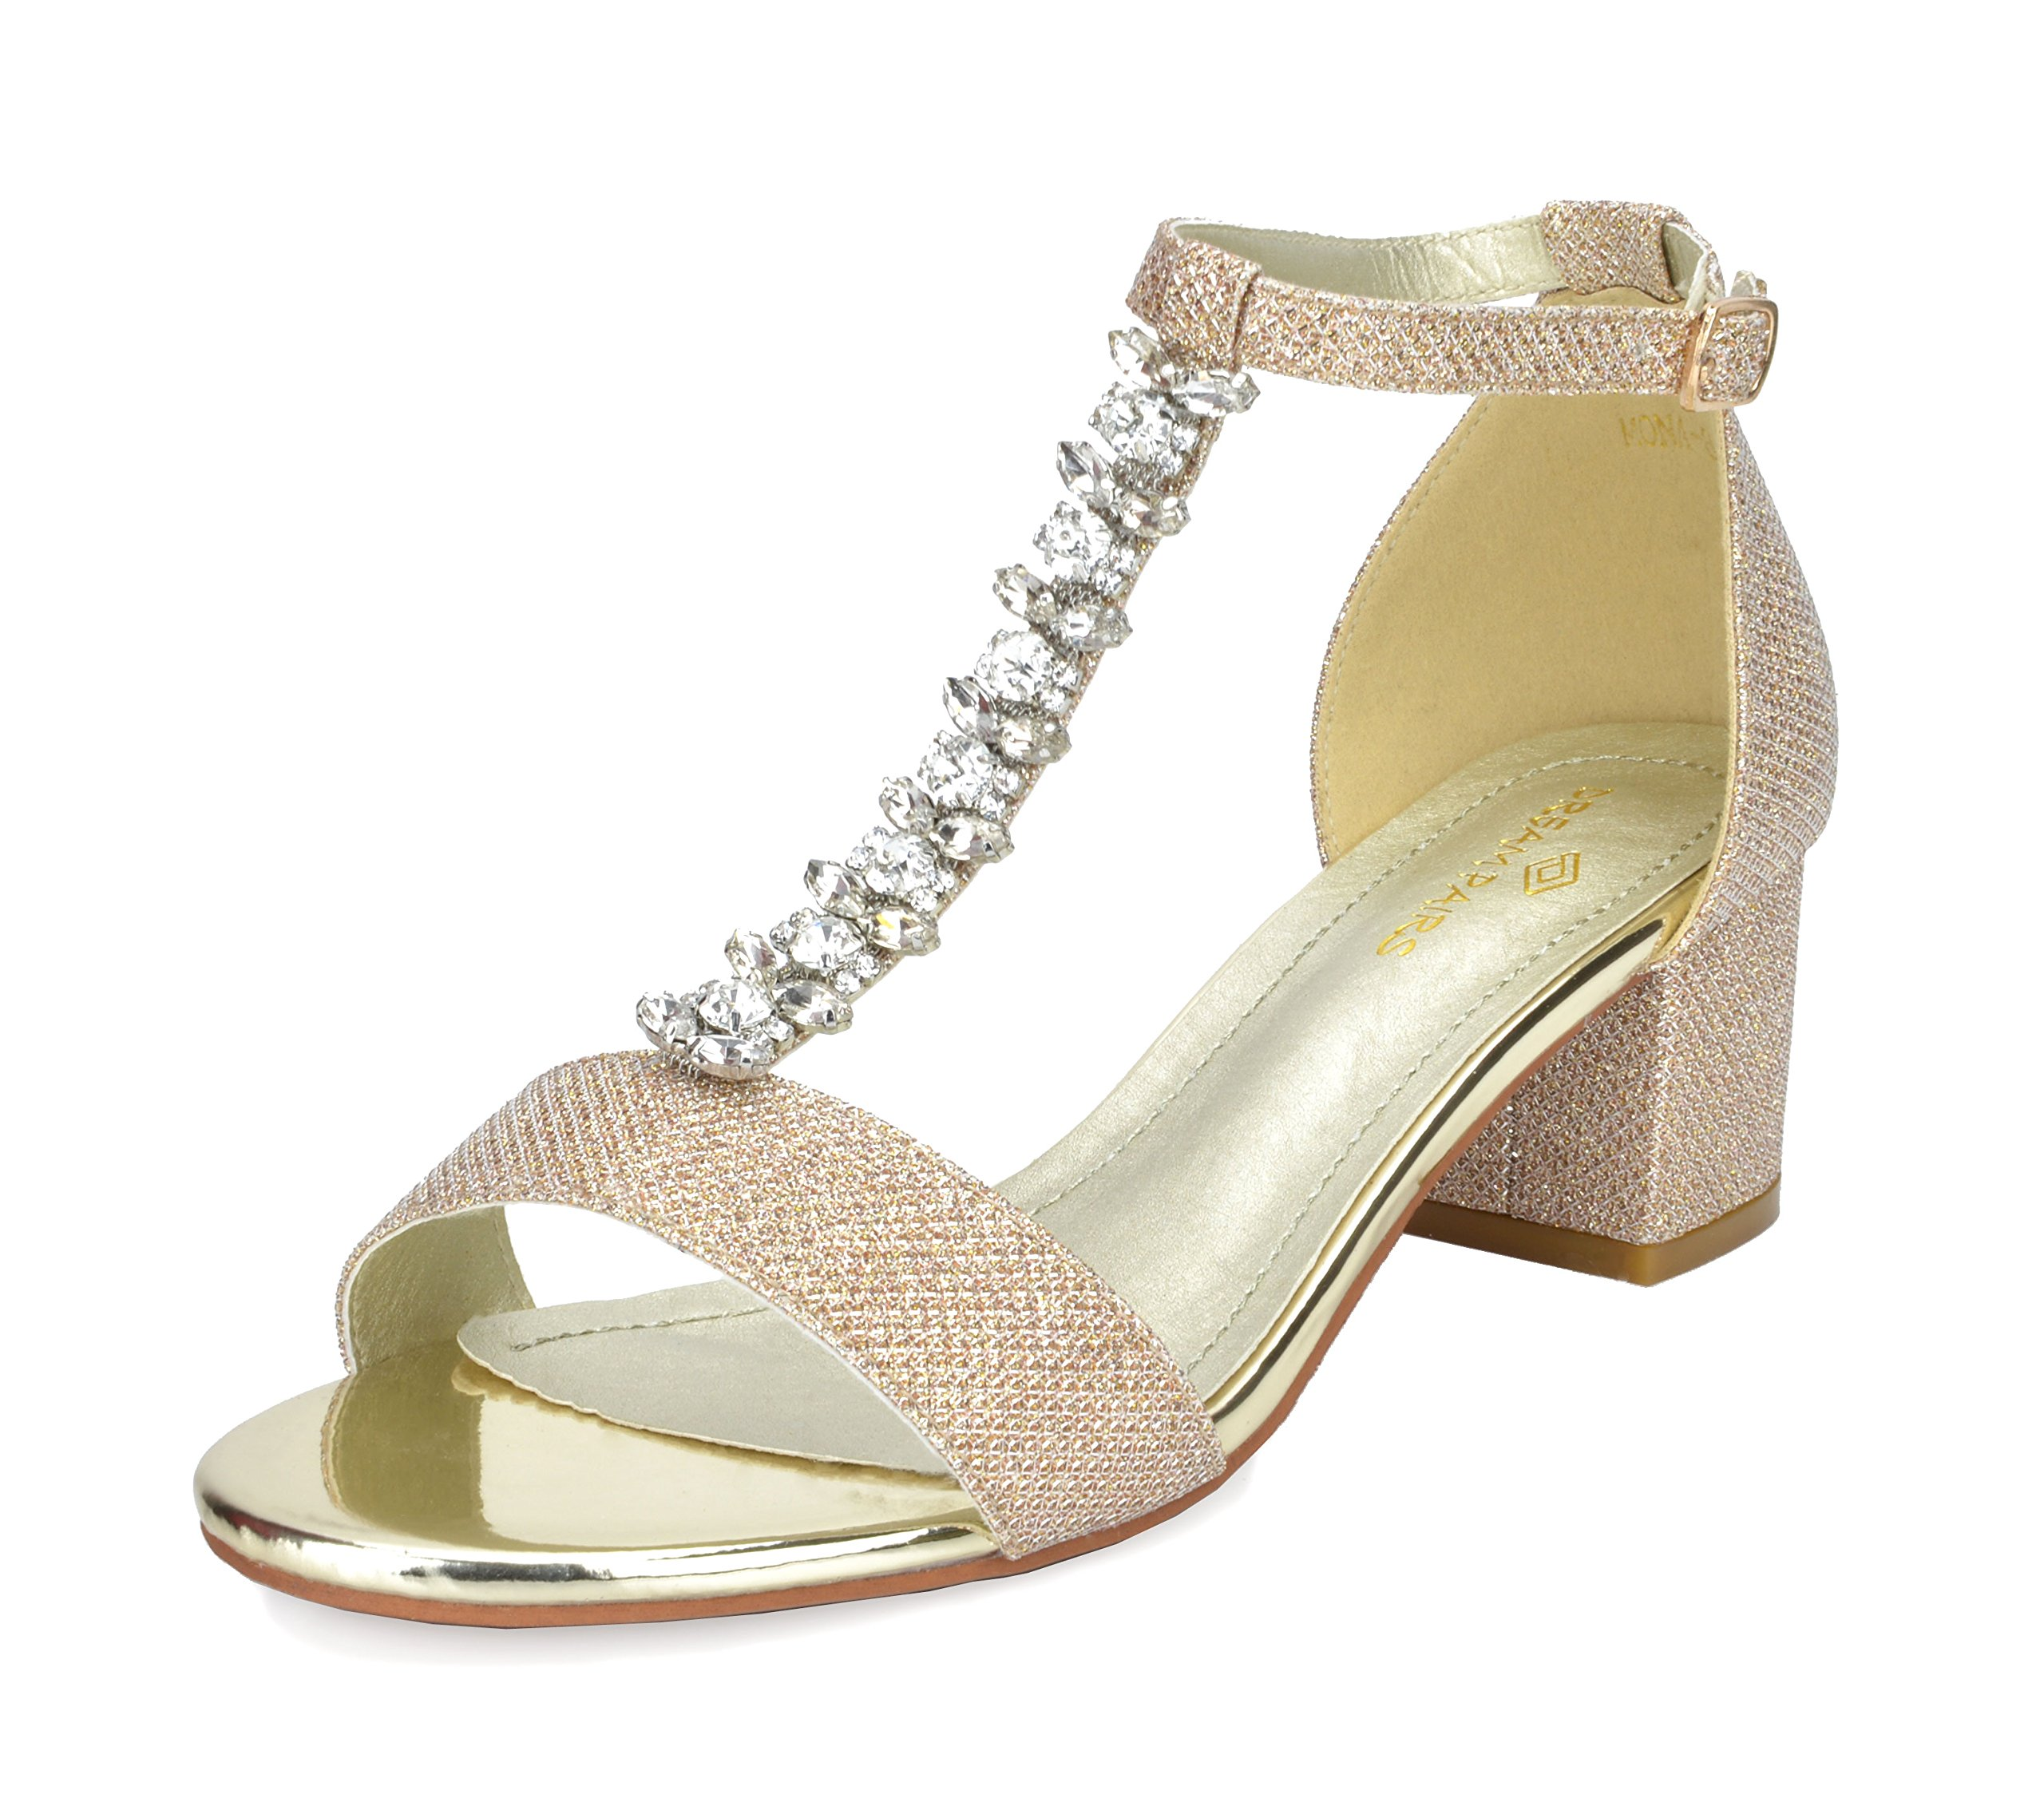 DREAM PAIRS Women's Mona_08 Gold Glitter Fashion Block Heeled Sandals Size 8 B(M) US